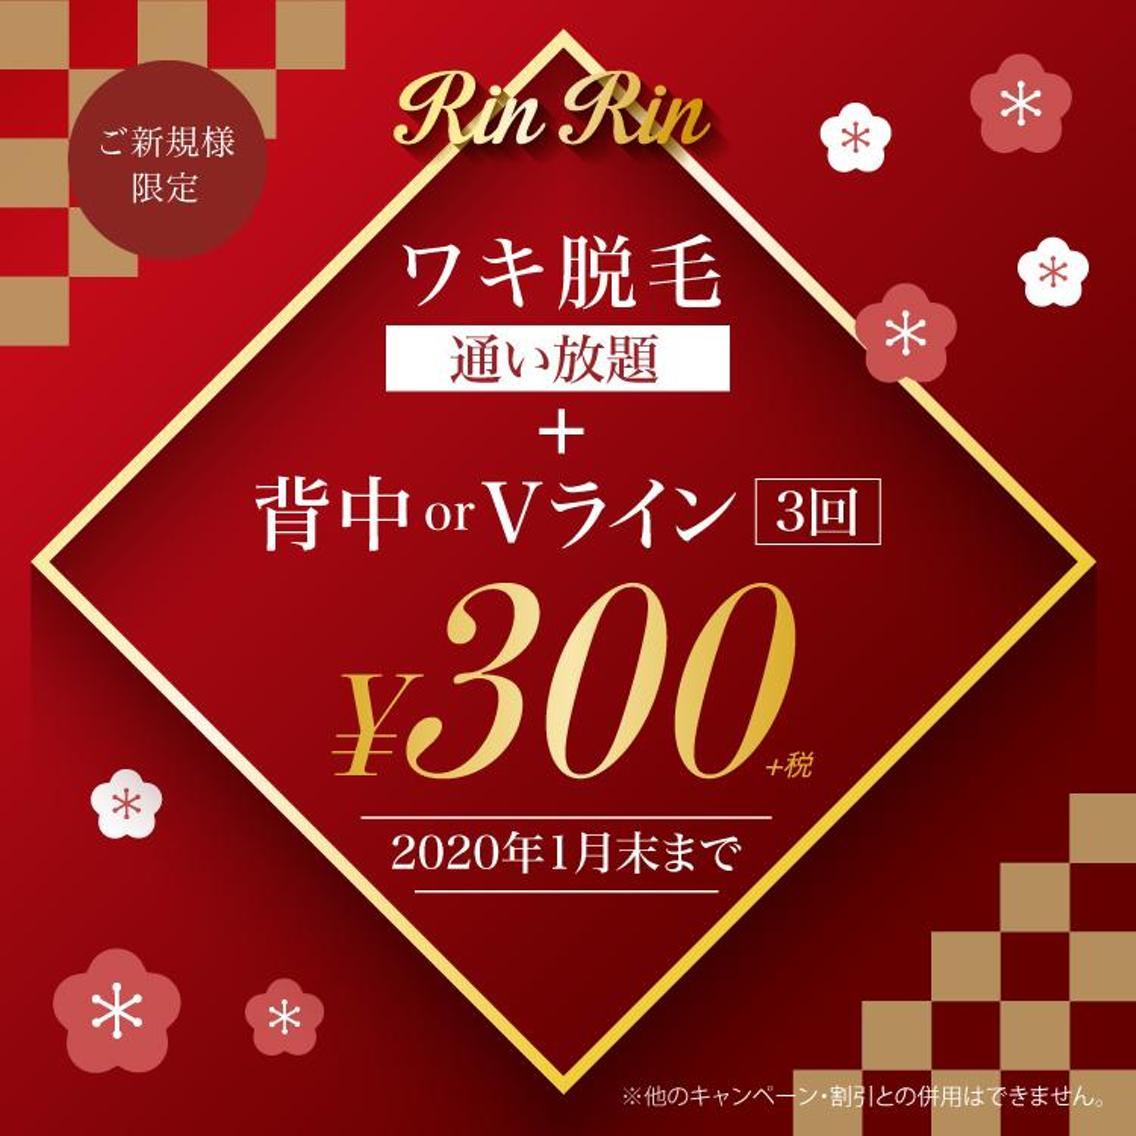 RinRin 松山店所属・RinRin 松山店の掲載